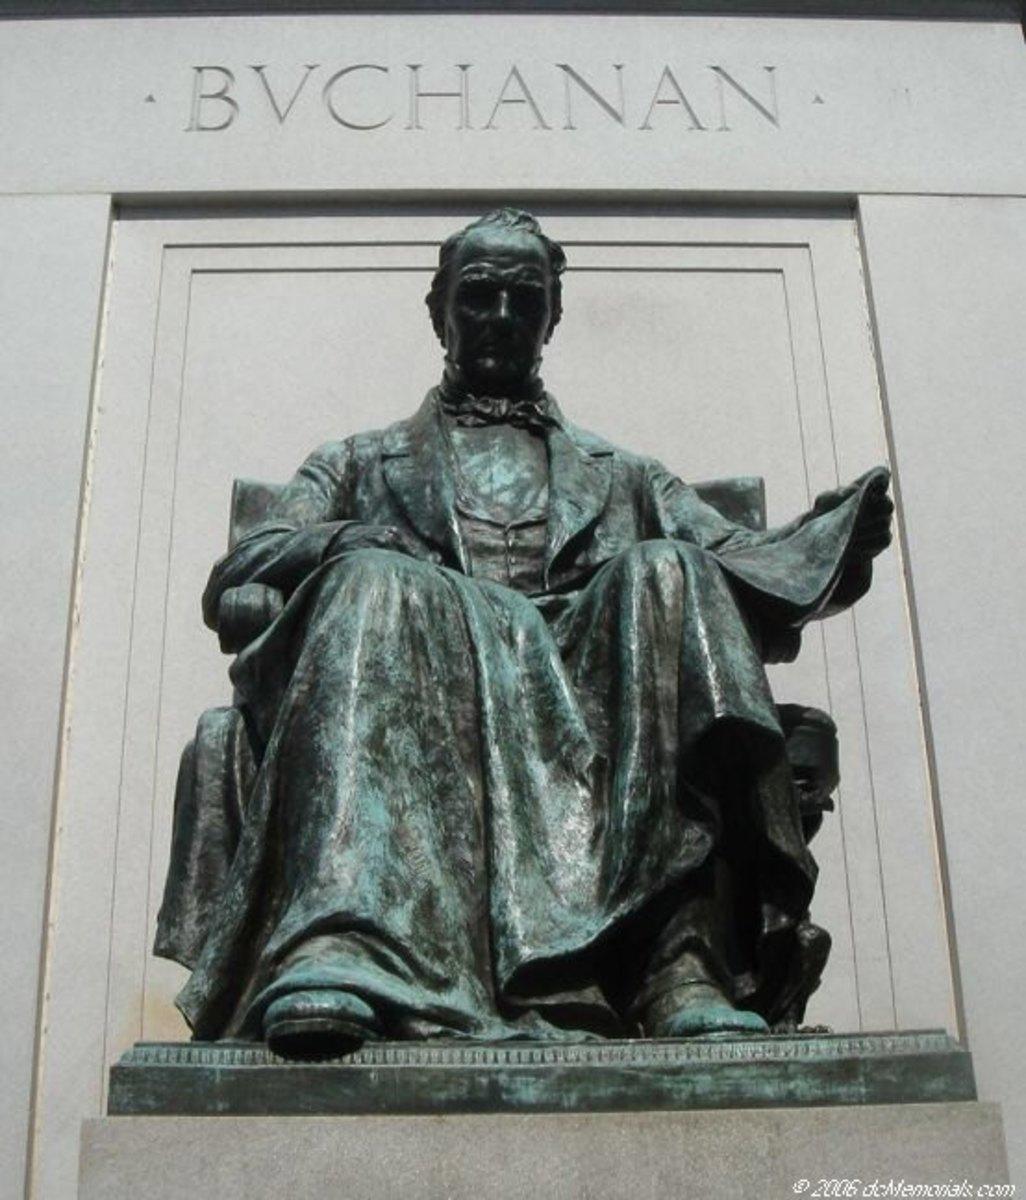 Buchanan Memorial